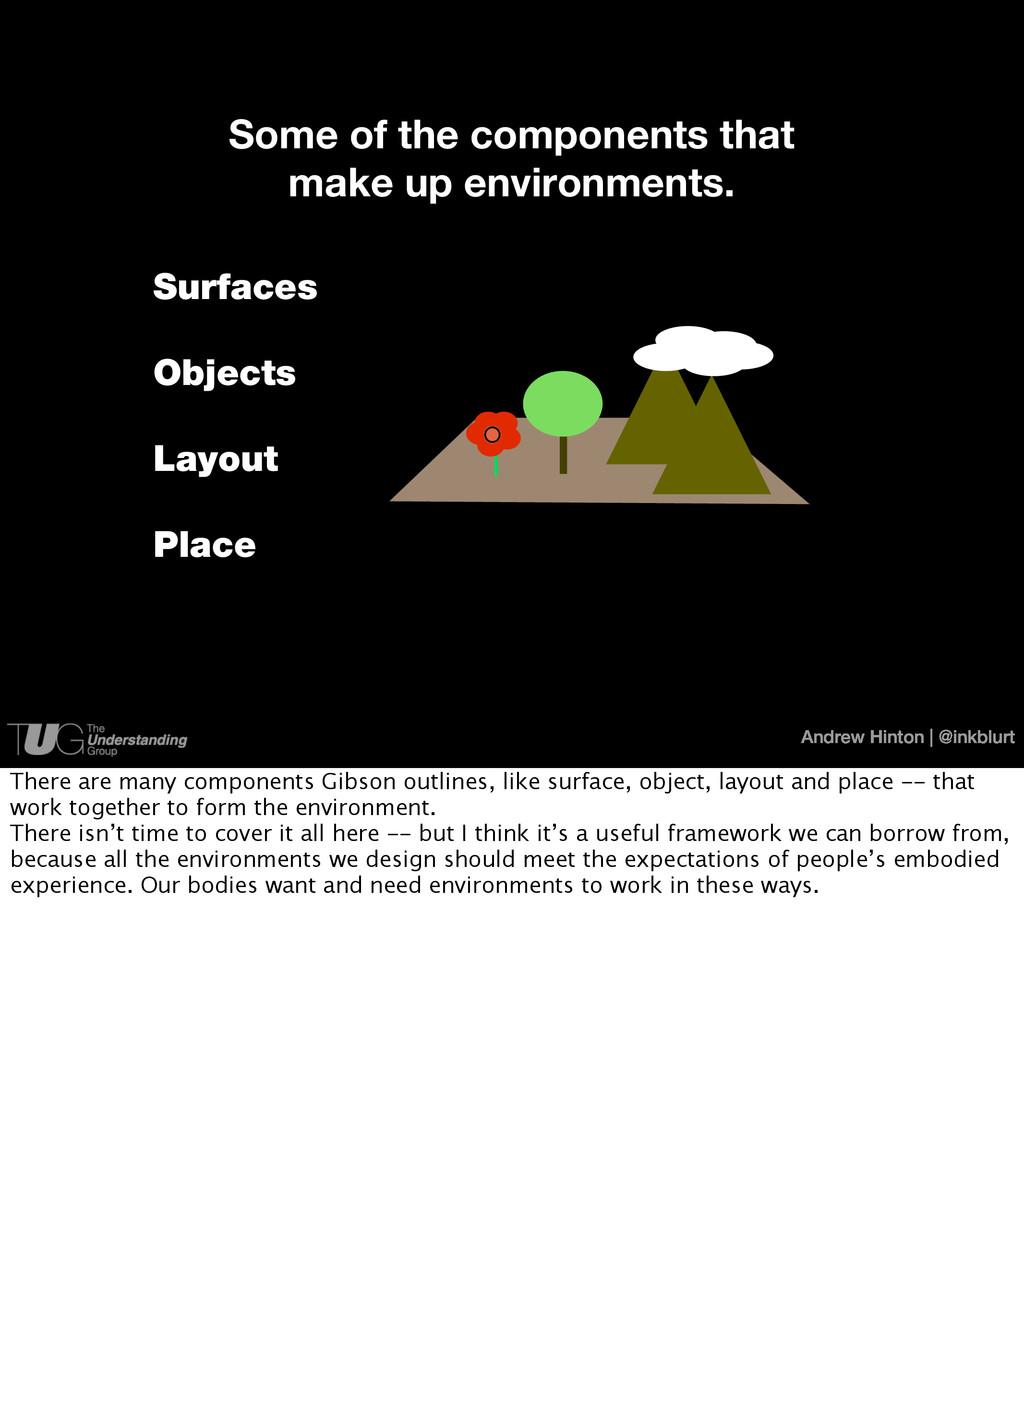 Andrew Hinton   @inkblurt Surfaces Objects Layo...